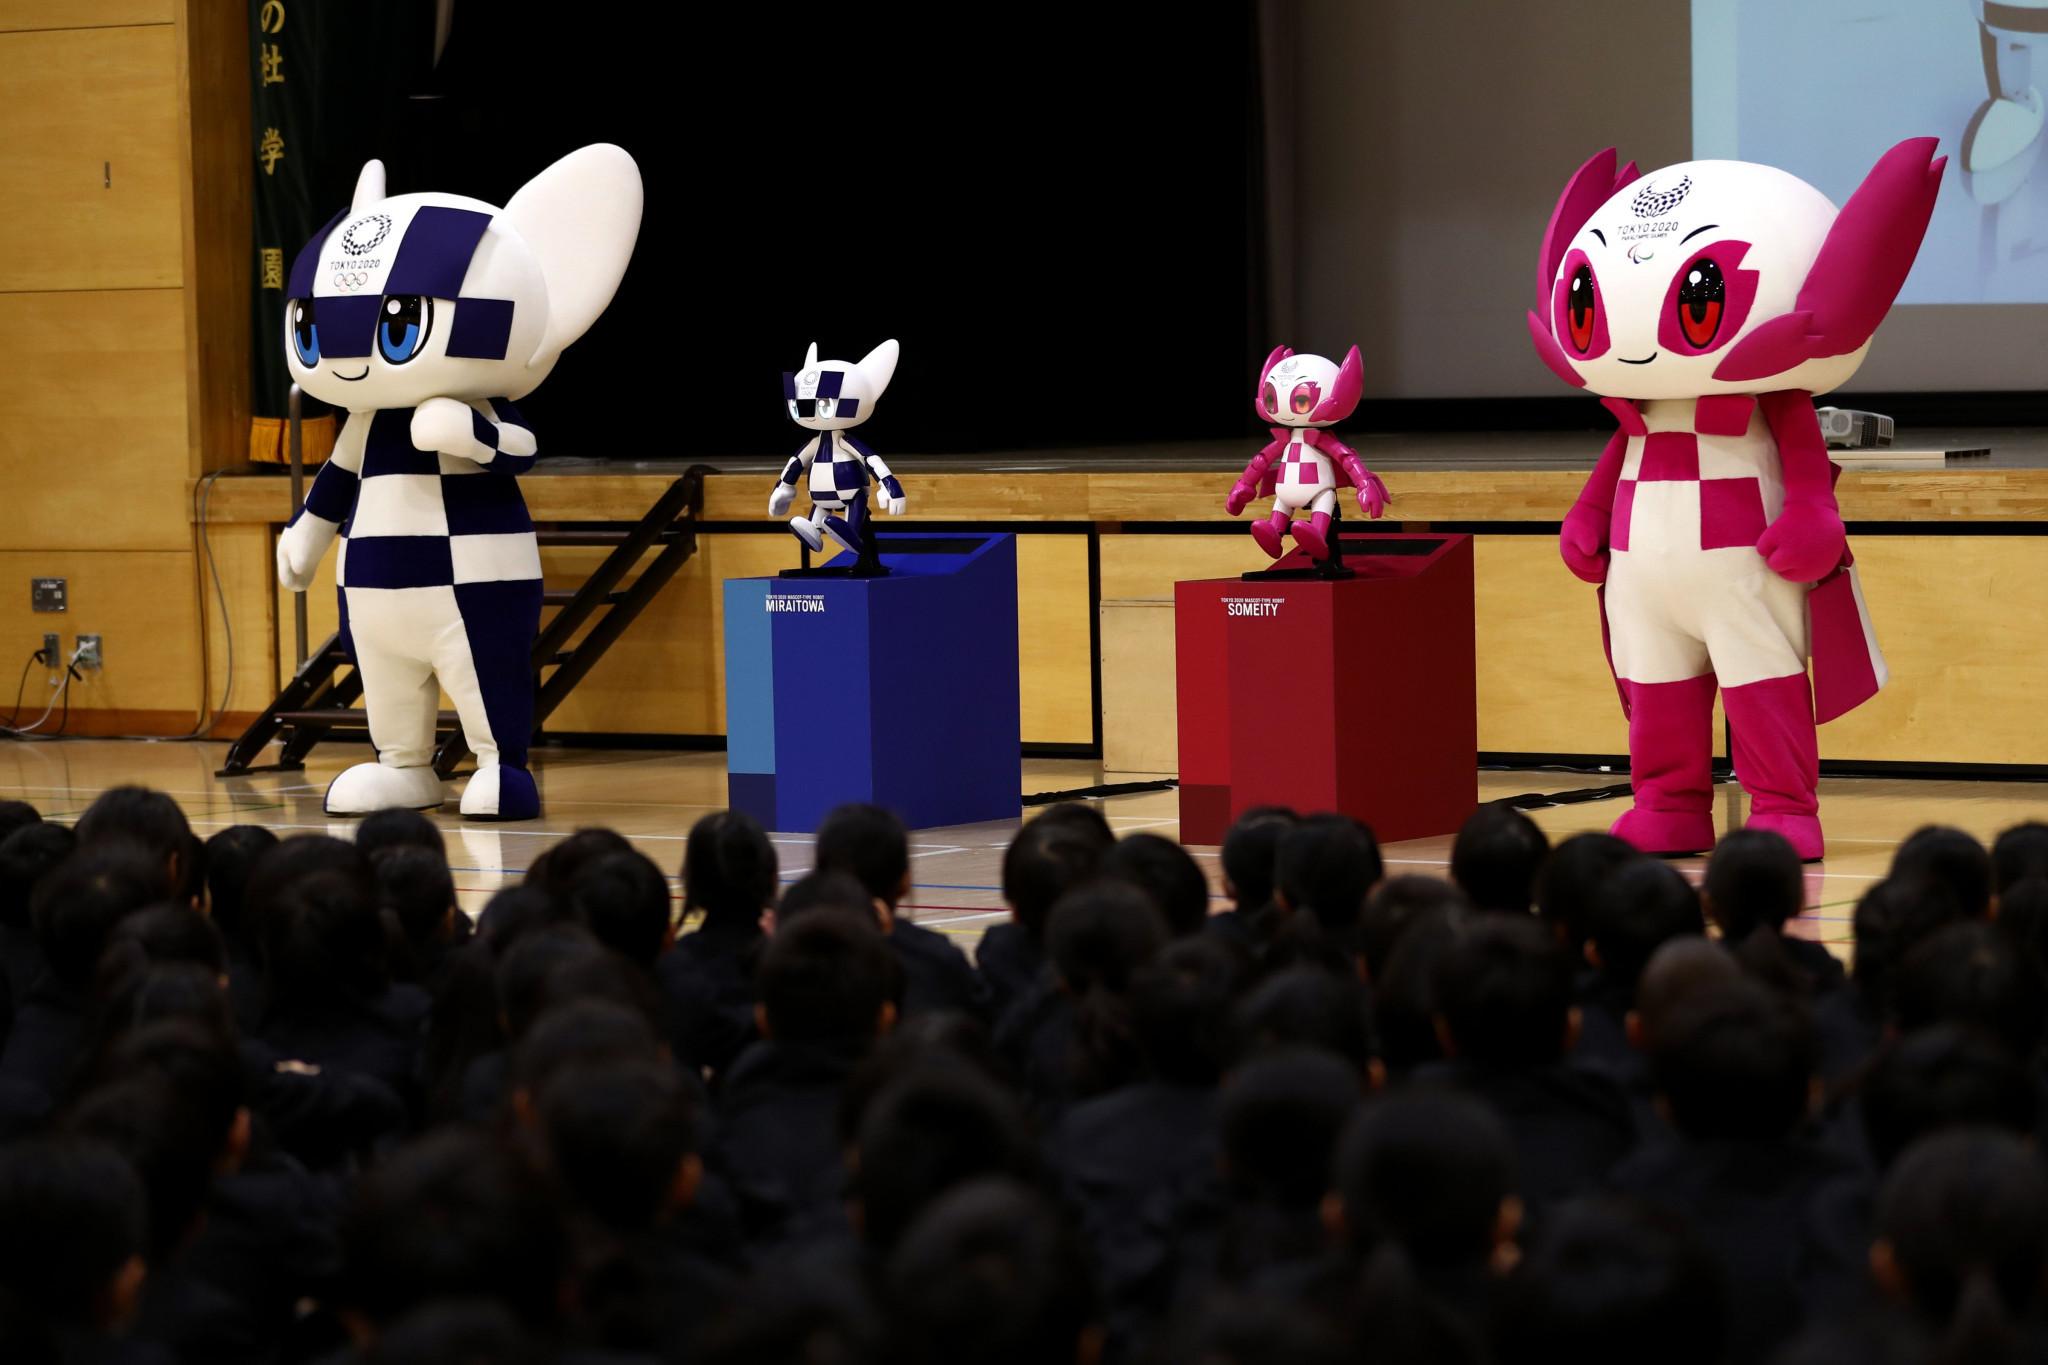 Tokyo 2020 demonstrate mascot robots with school pupils